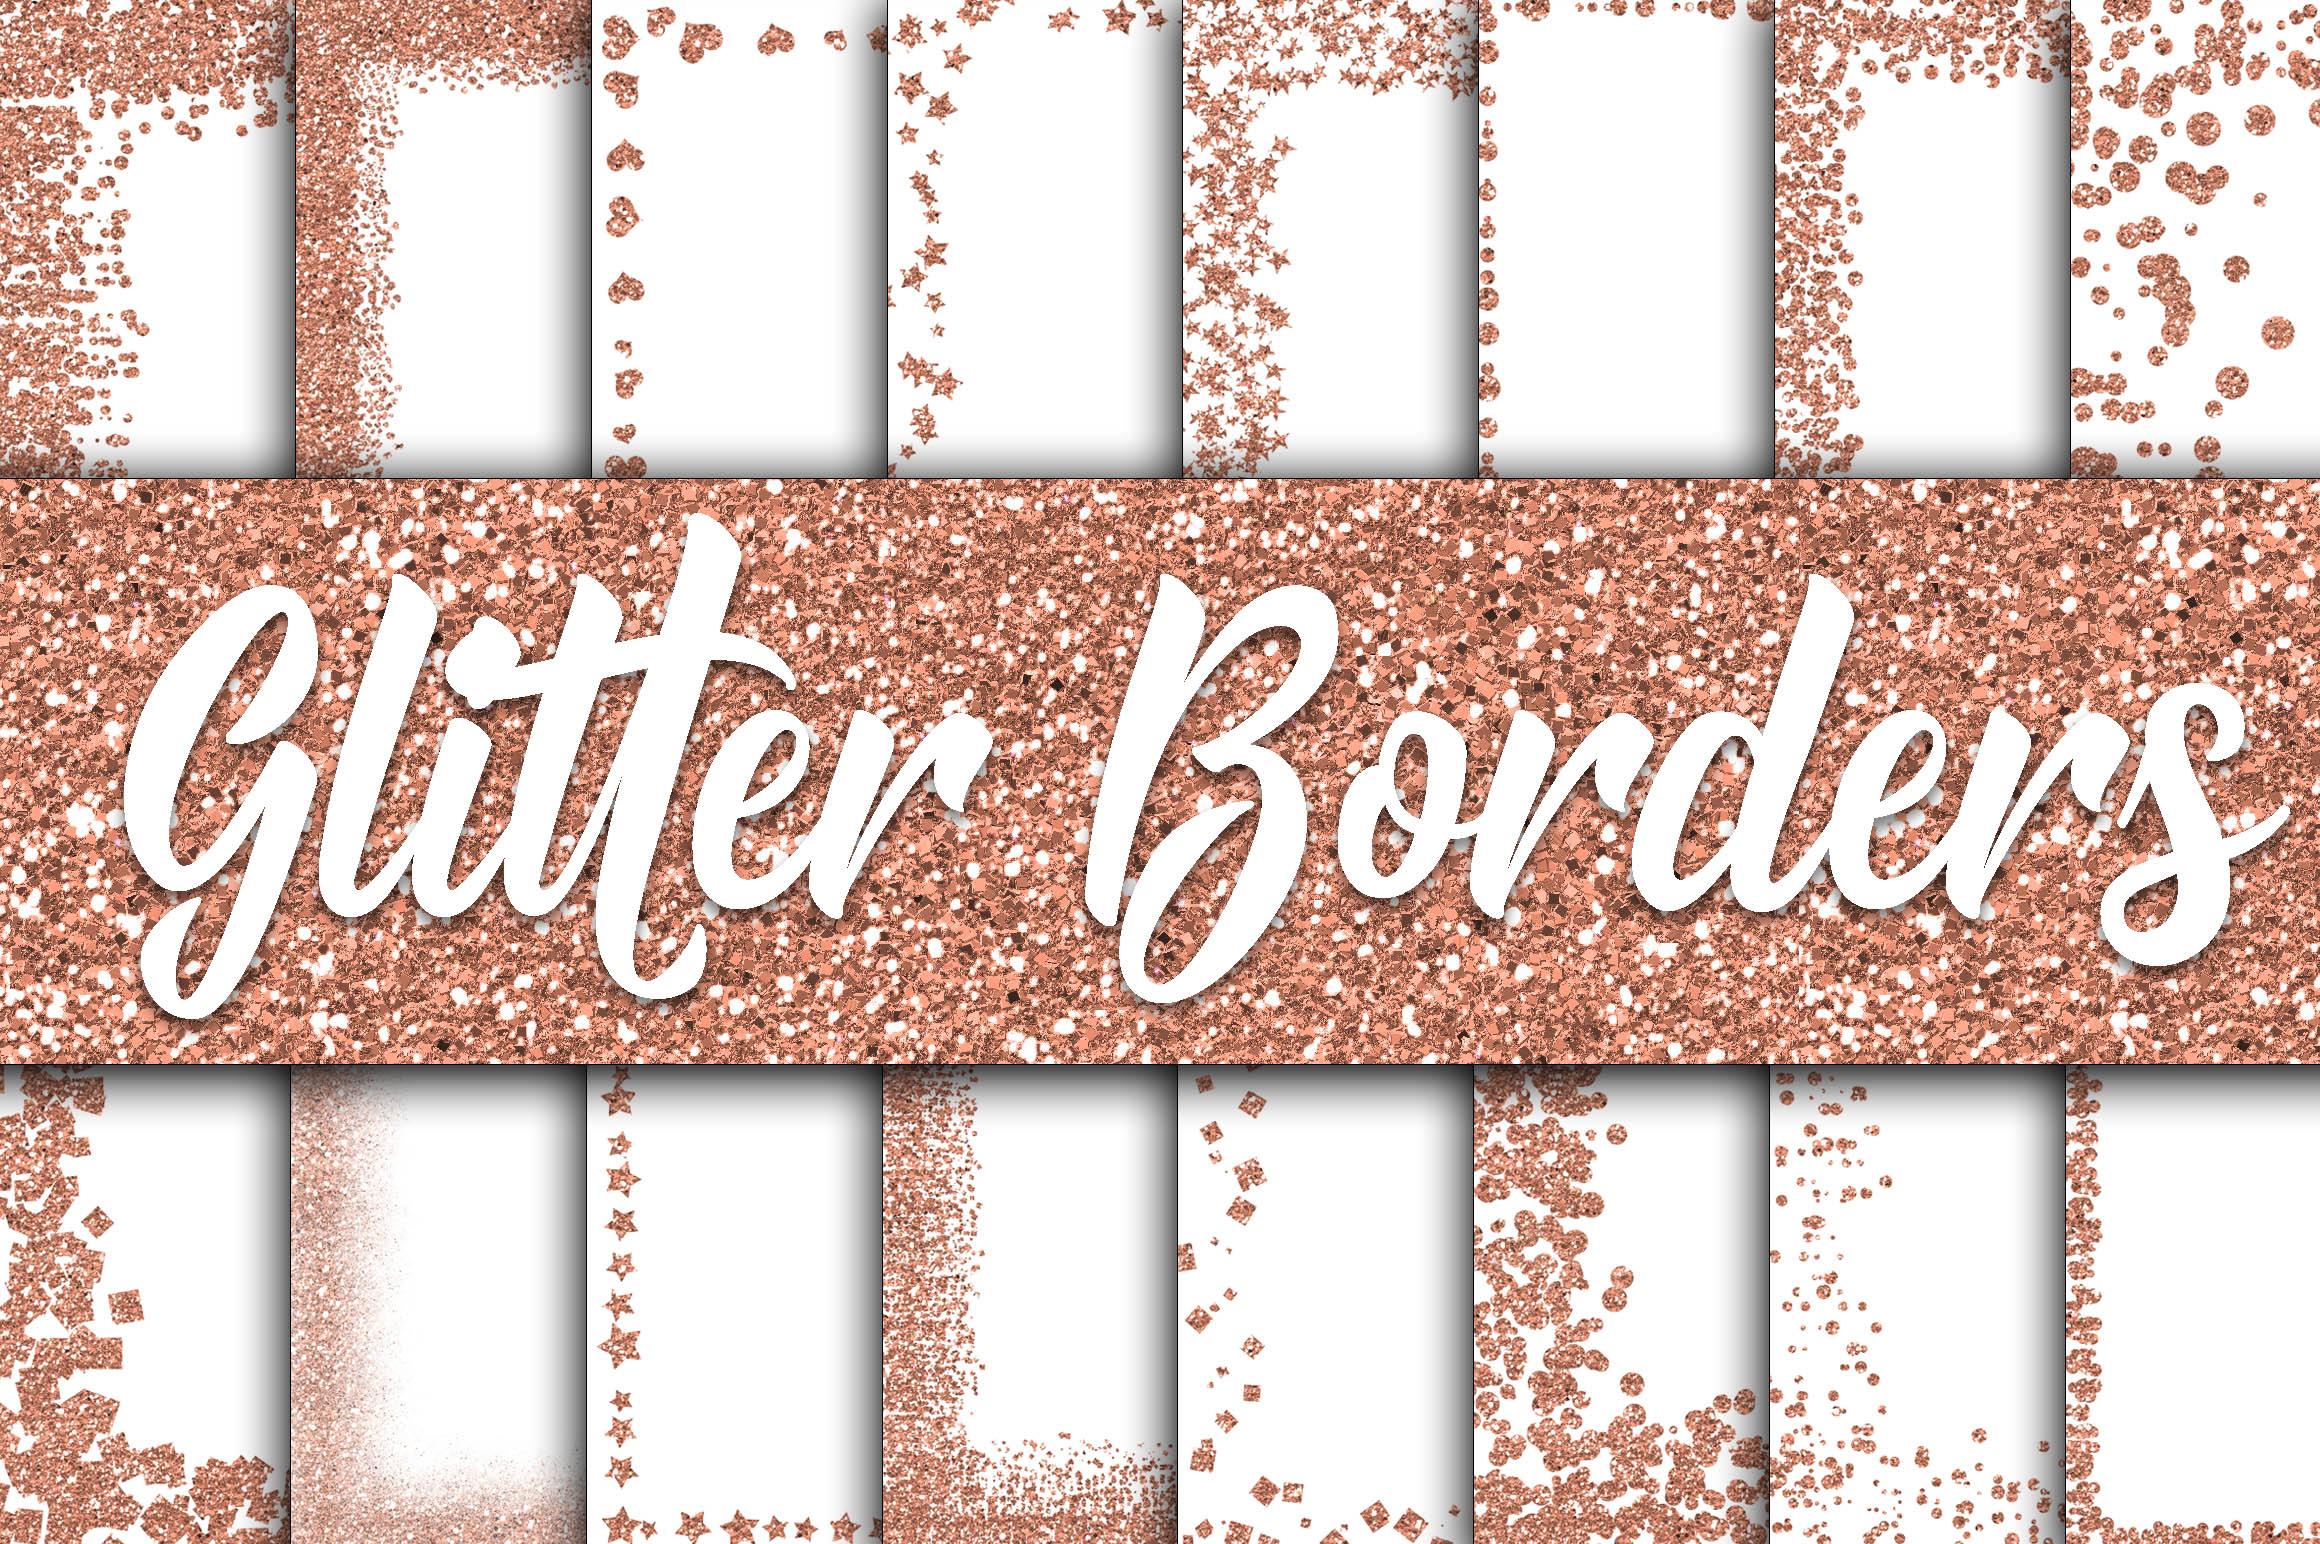 Rose Gold Glitter Borders Digital Paper example image 1